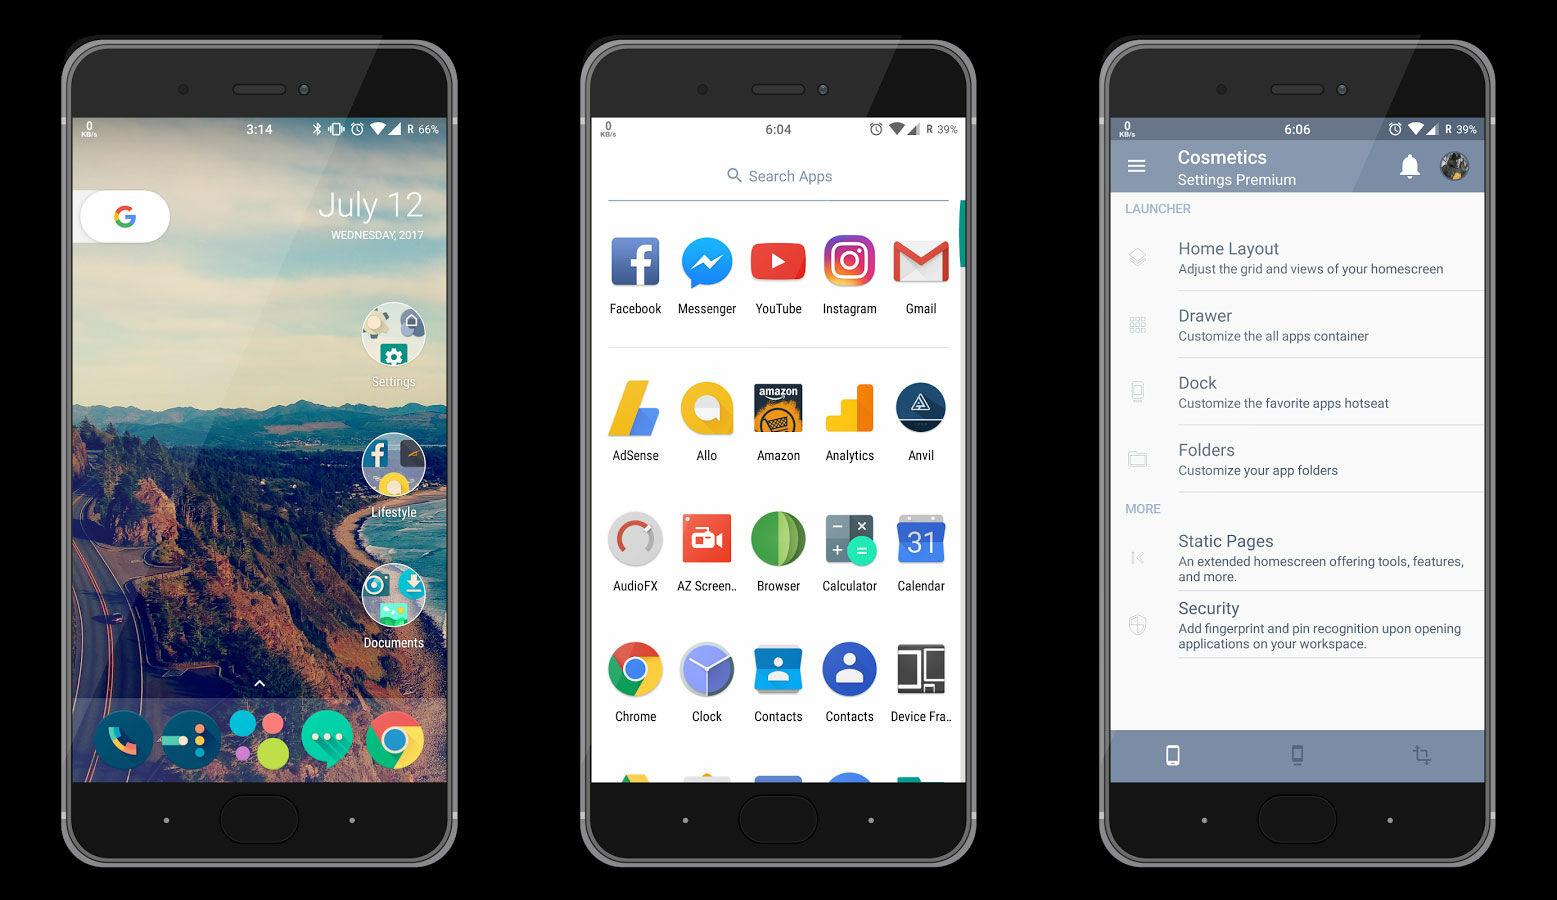 Aplikasi Android Terbaru Agustus 2017 Sapphyx